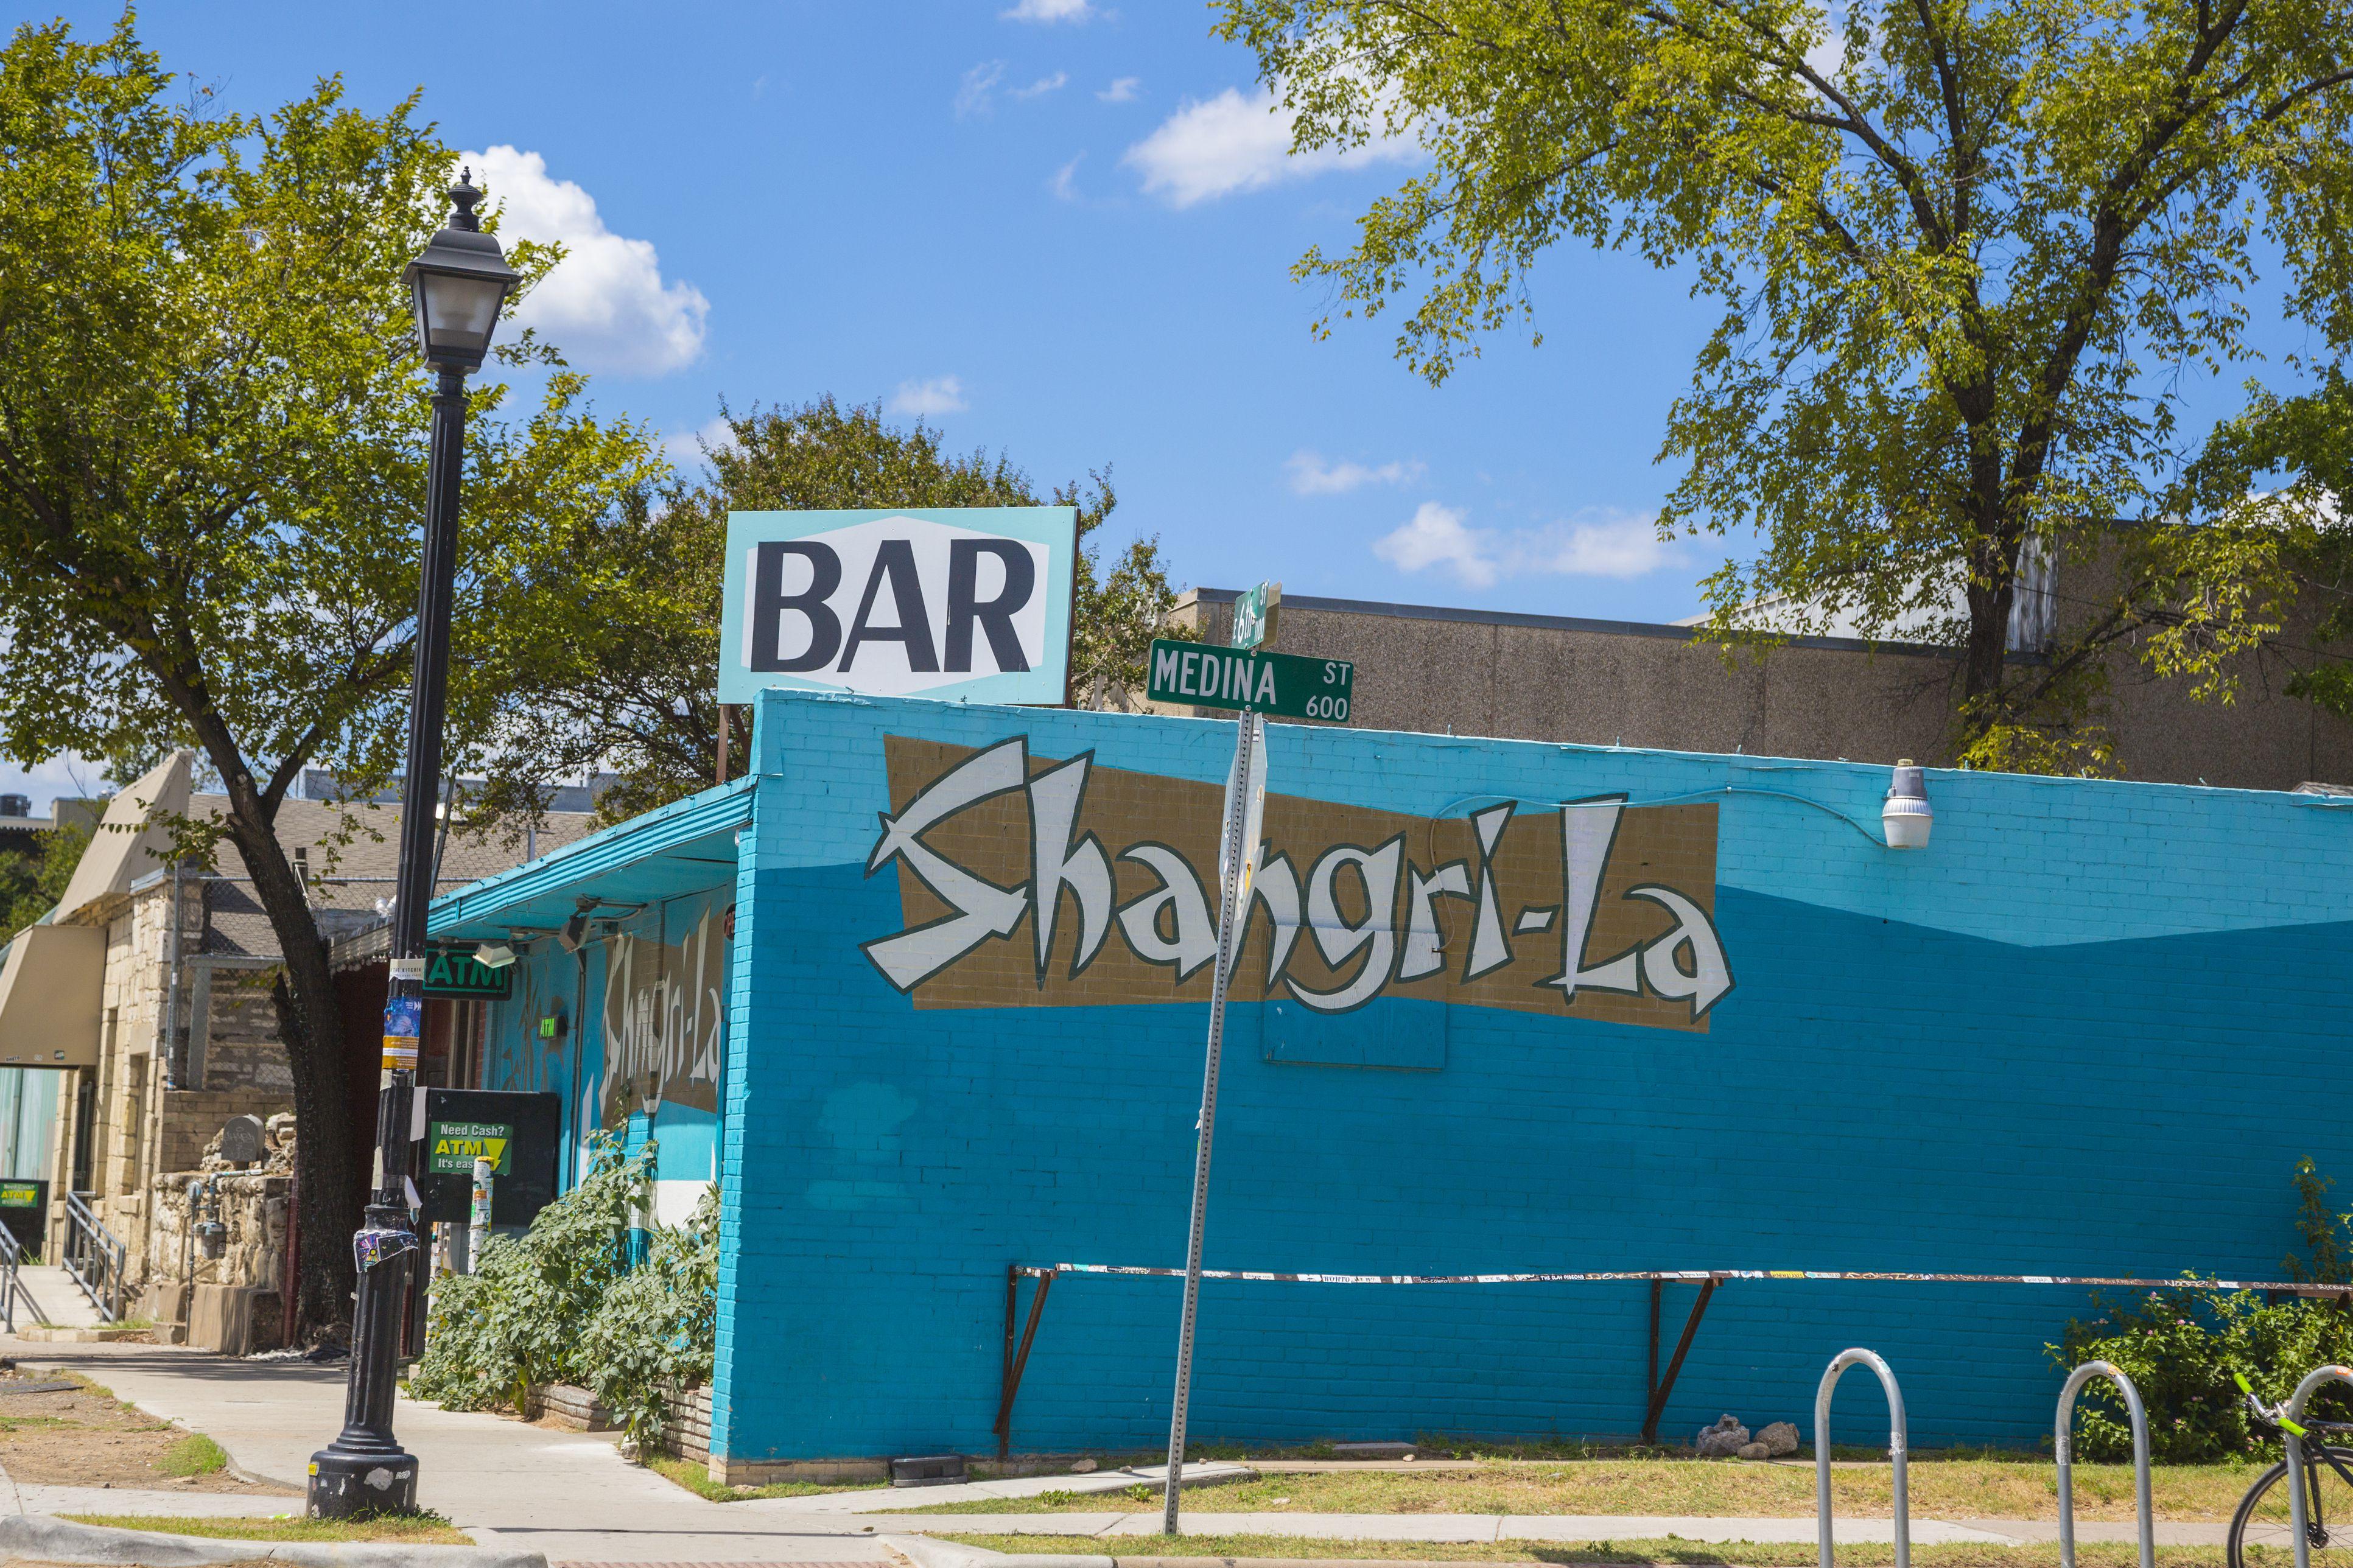 Shangri-La bar on East 6th St, East Austin, Texas